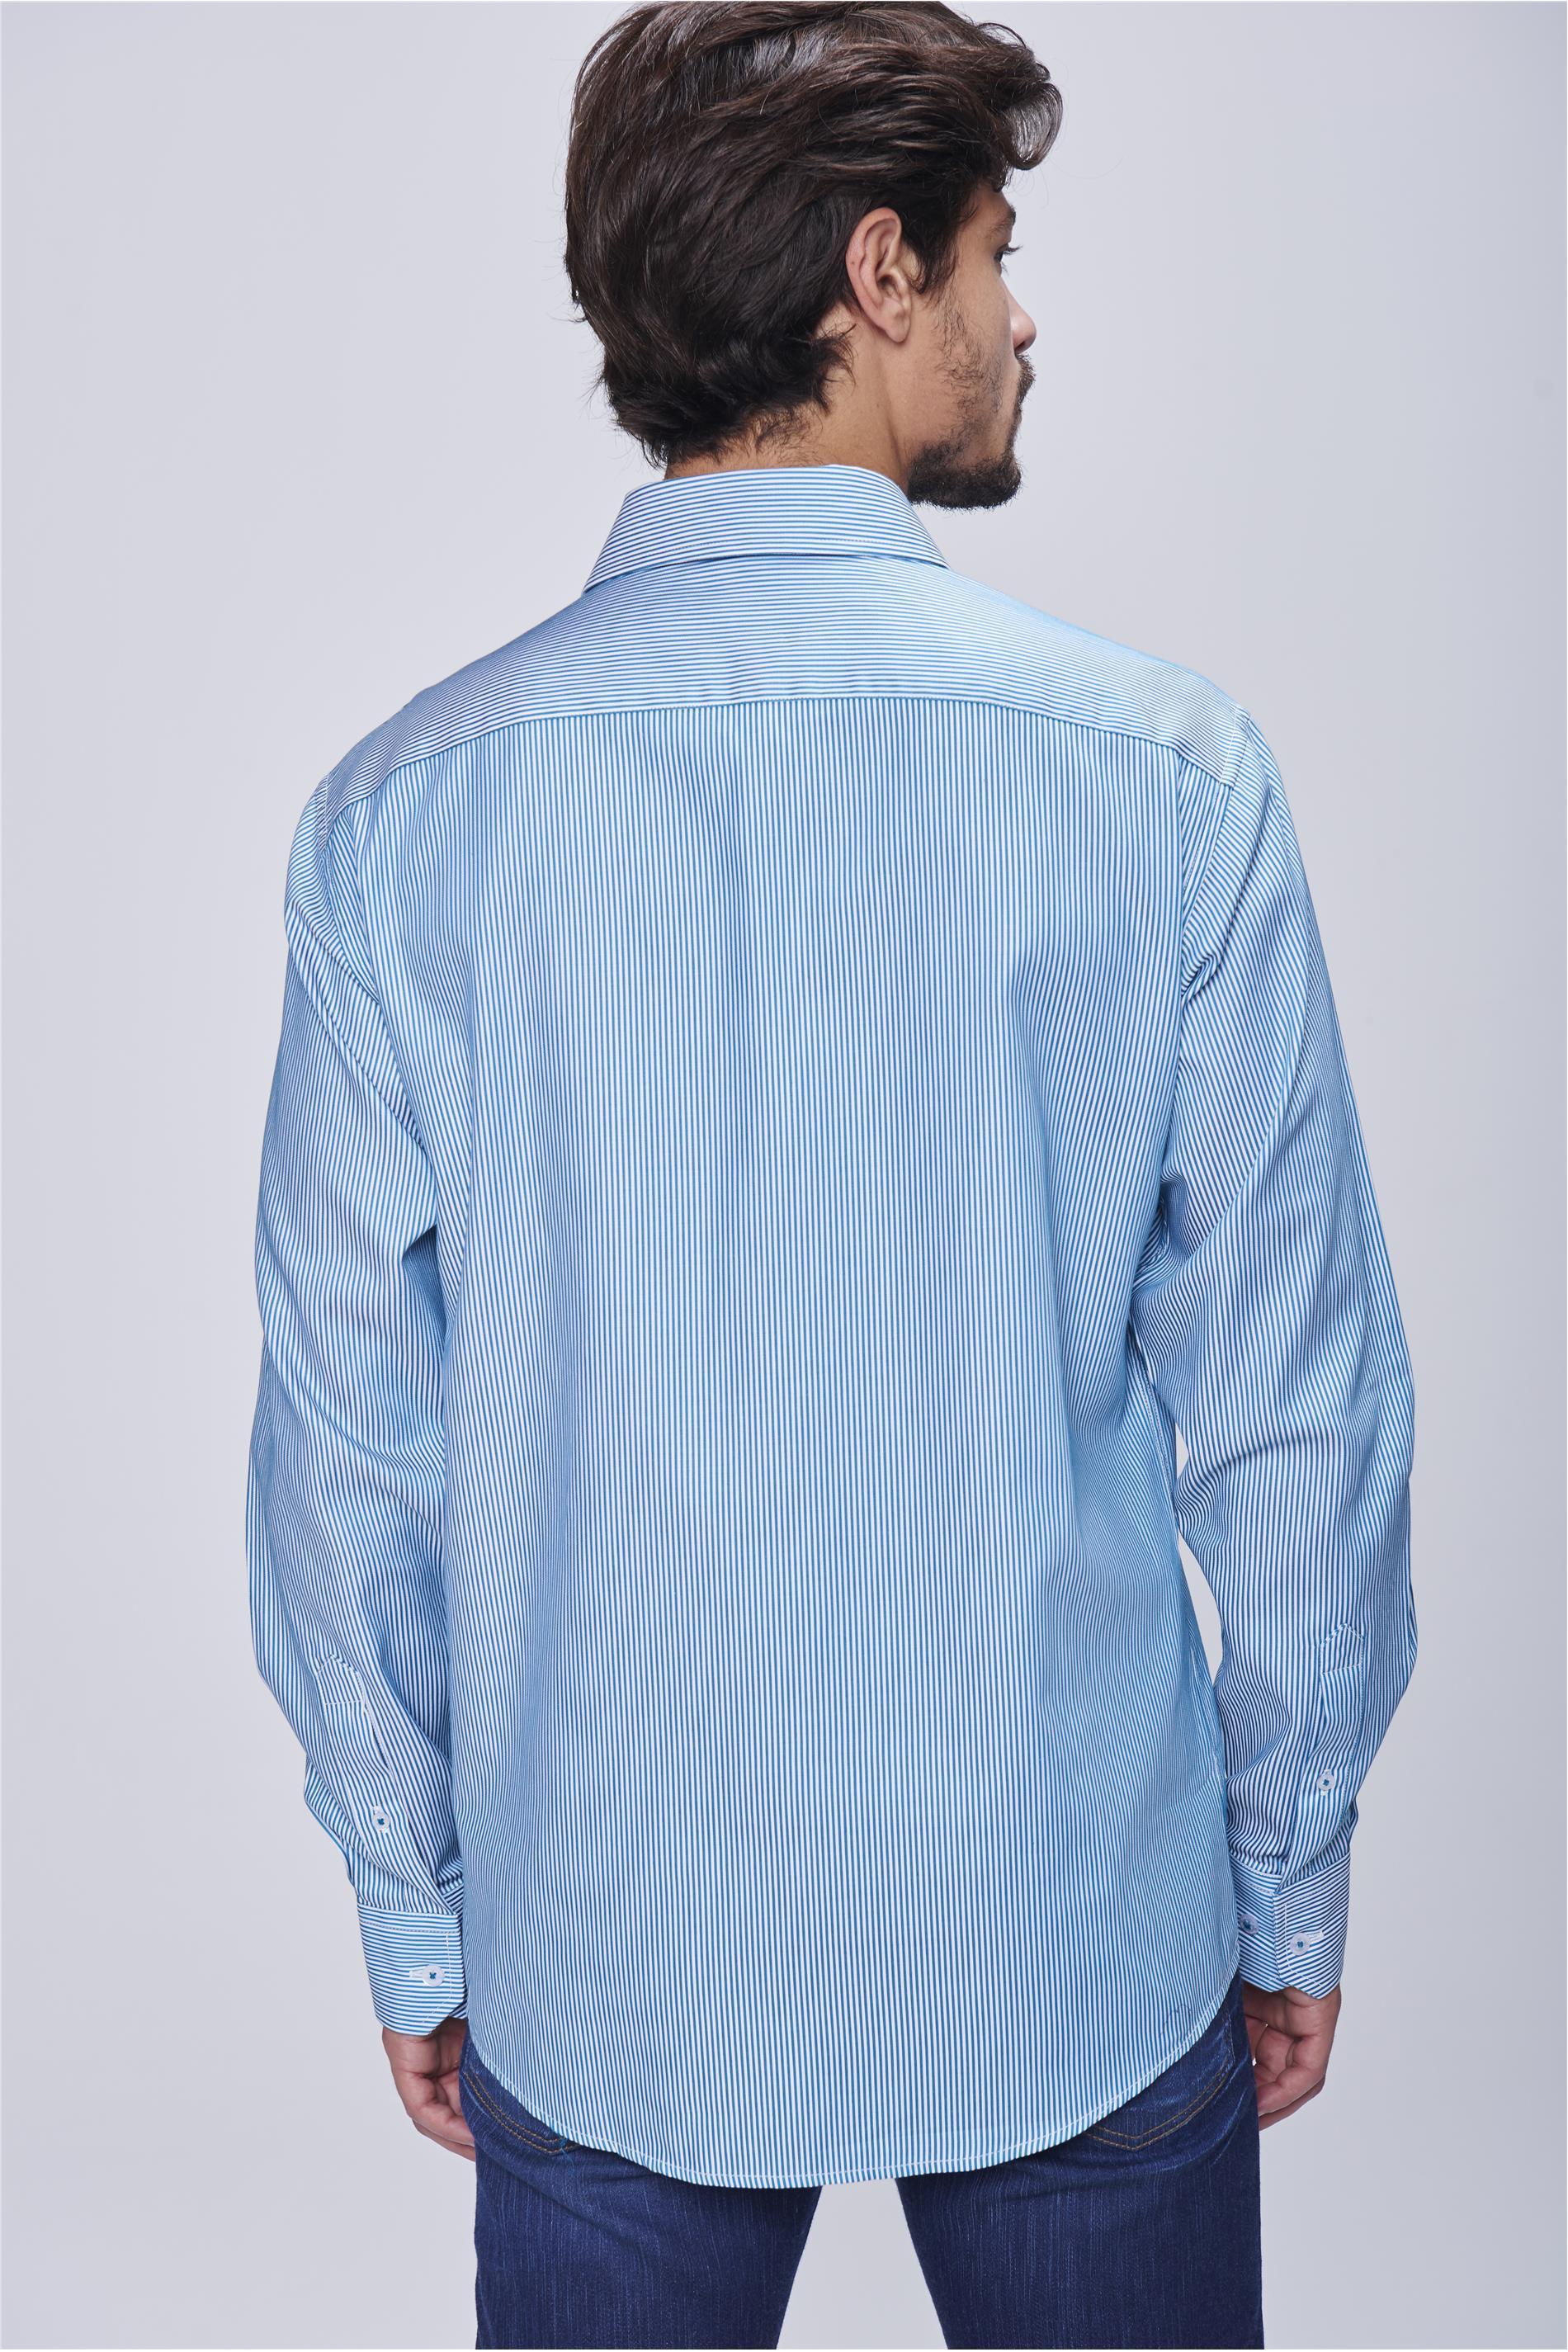 b62b66583785 Camisa Social Listrada Masculina - Damyller